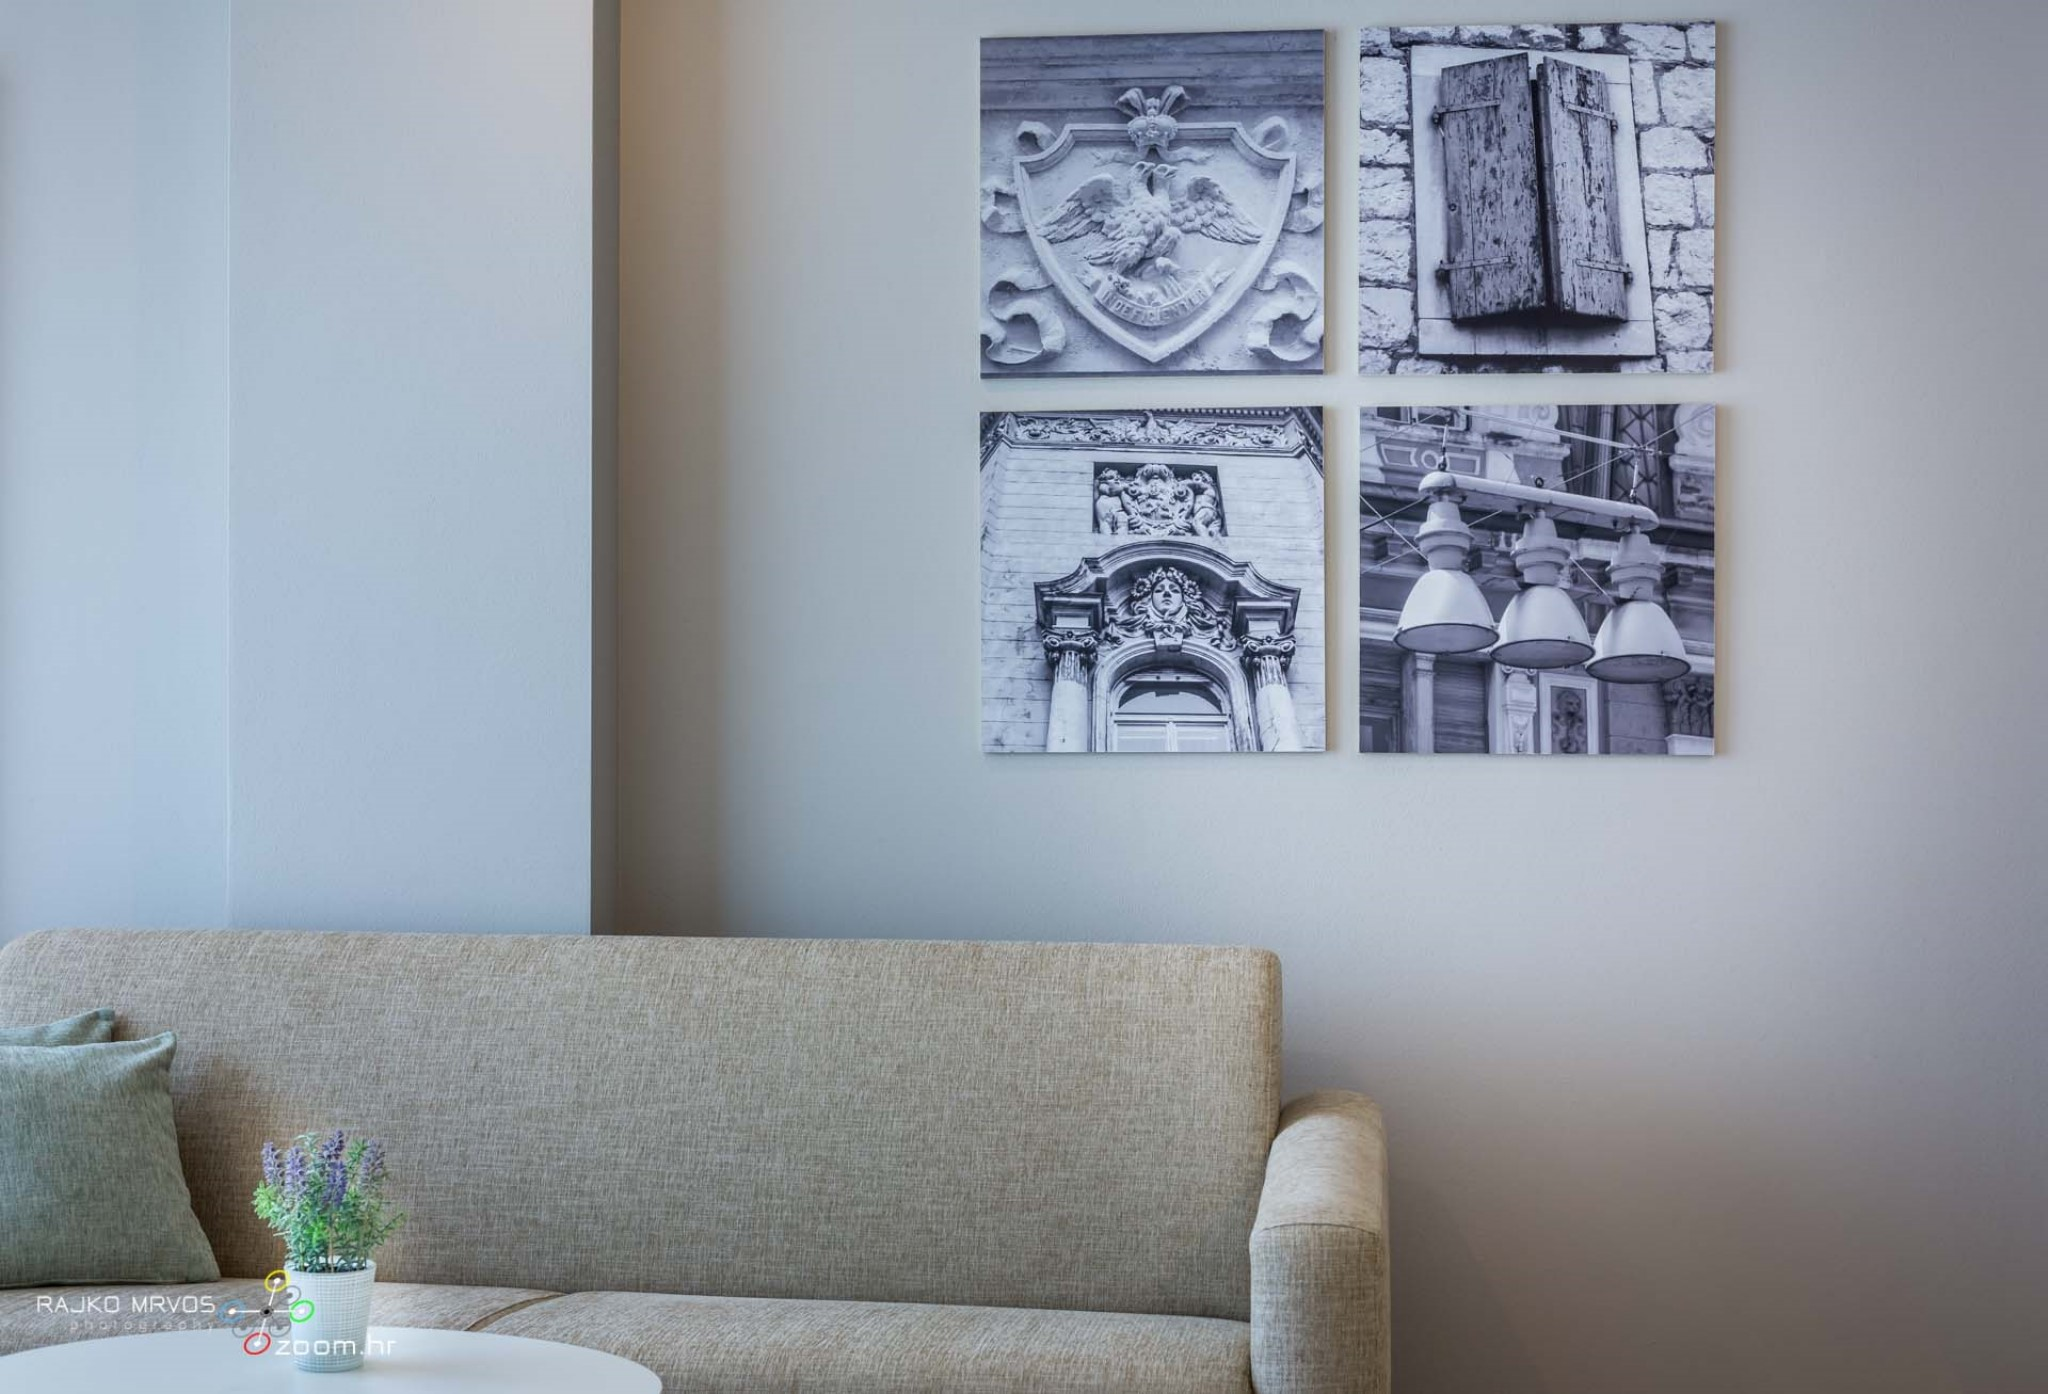 fotografiranje-interijera-fotograf-eksterijera-apartmana-vila-kuca-apartmani-Preelook-64